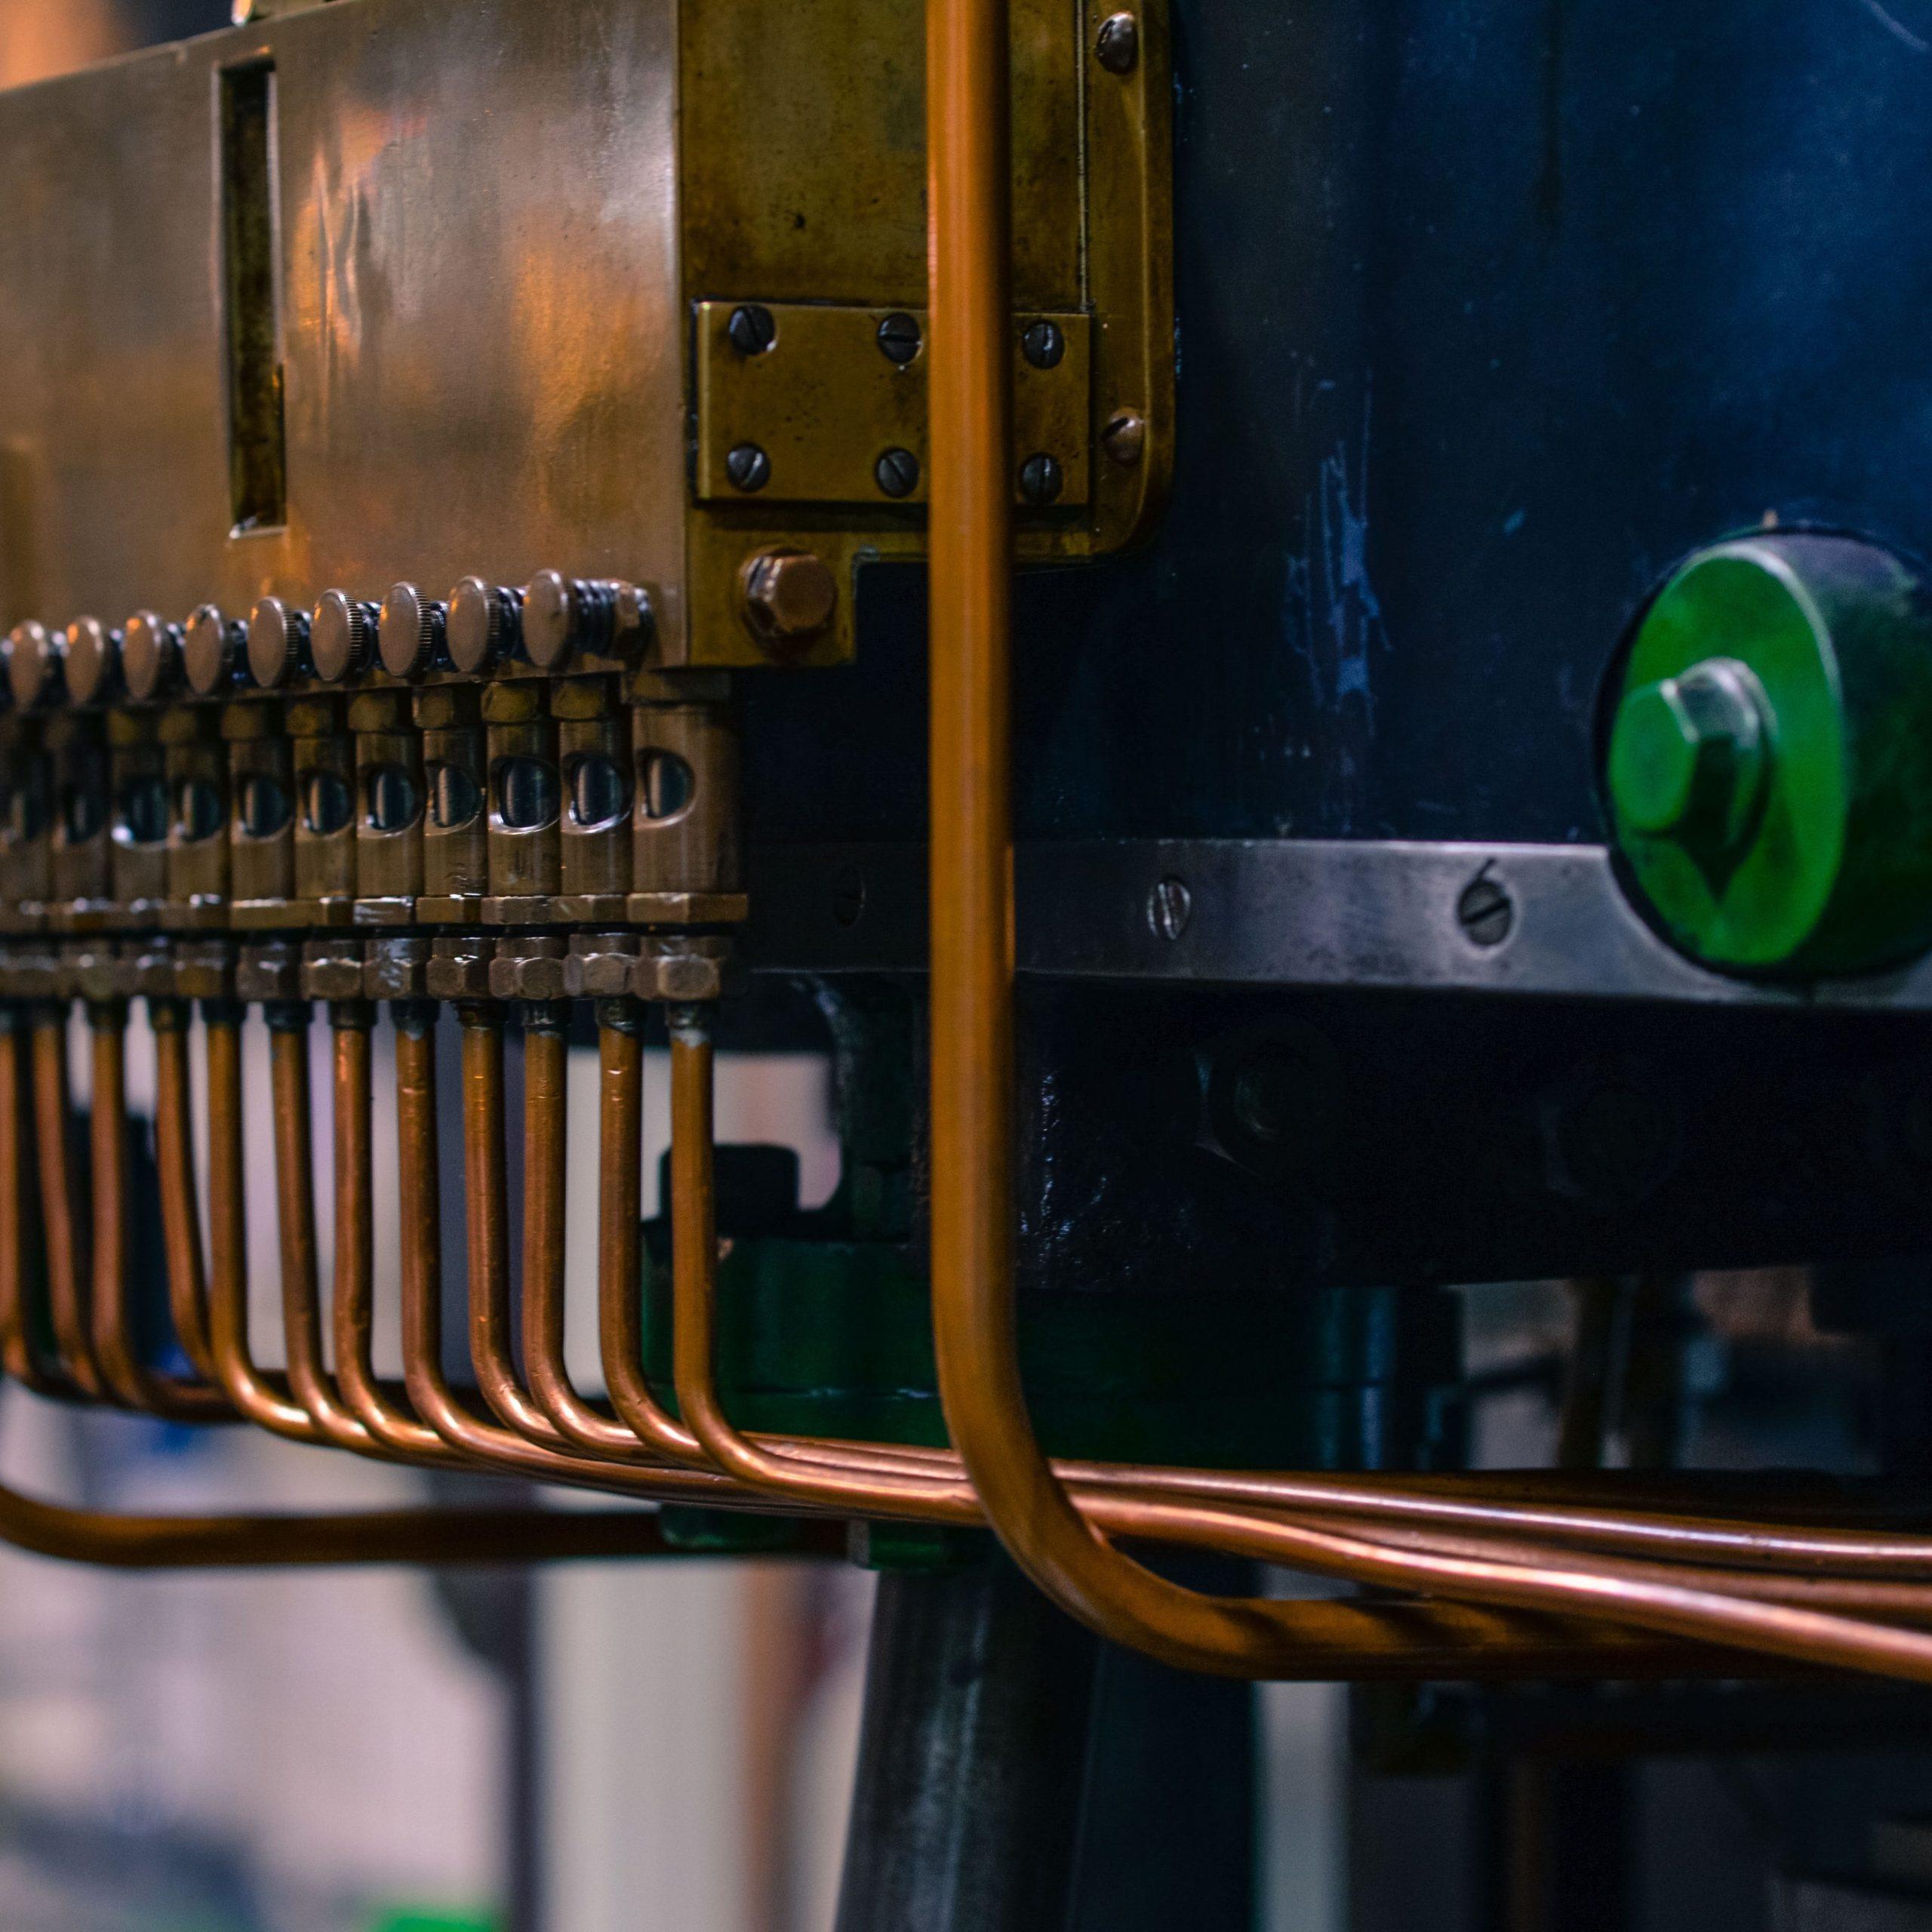 engine-engineering-equipment-633860-square